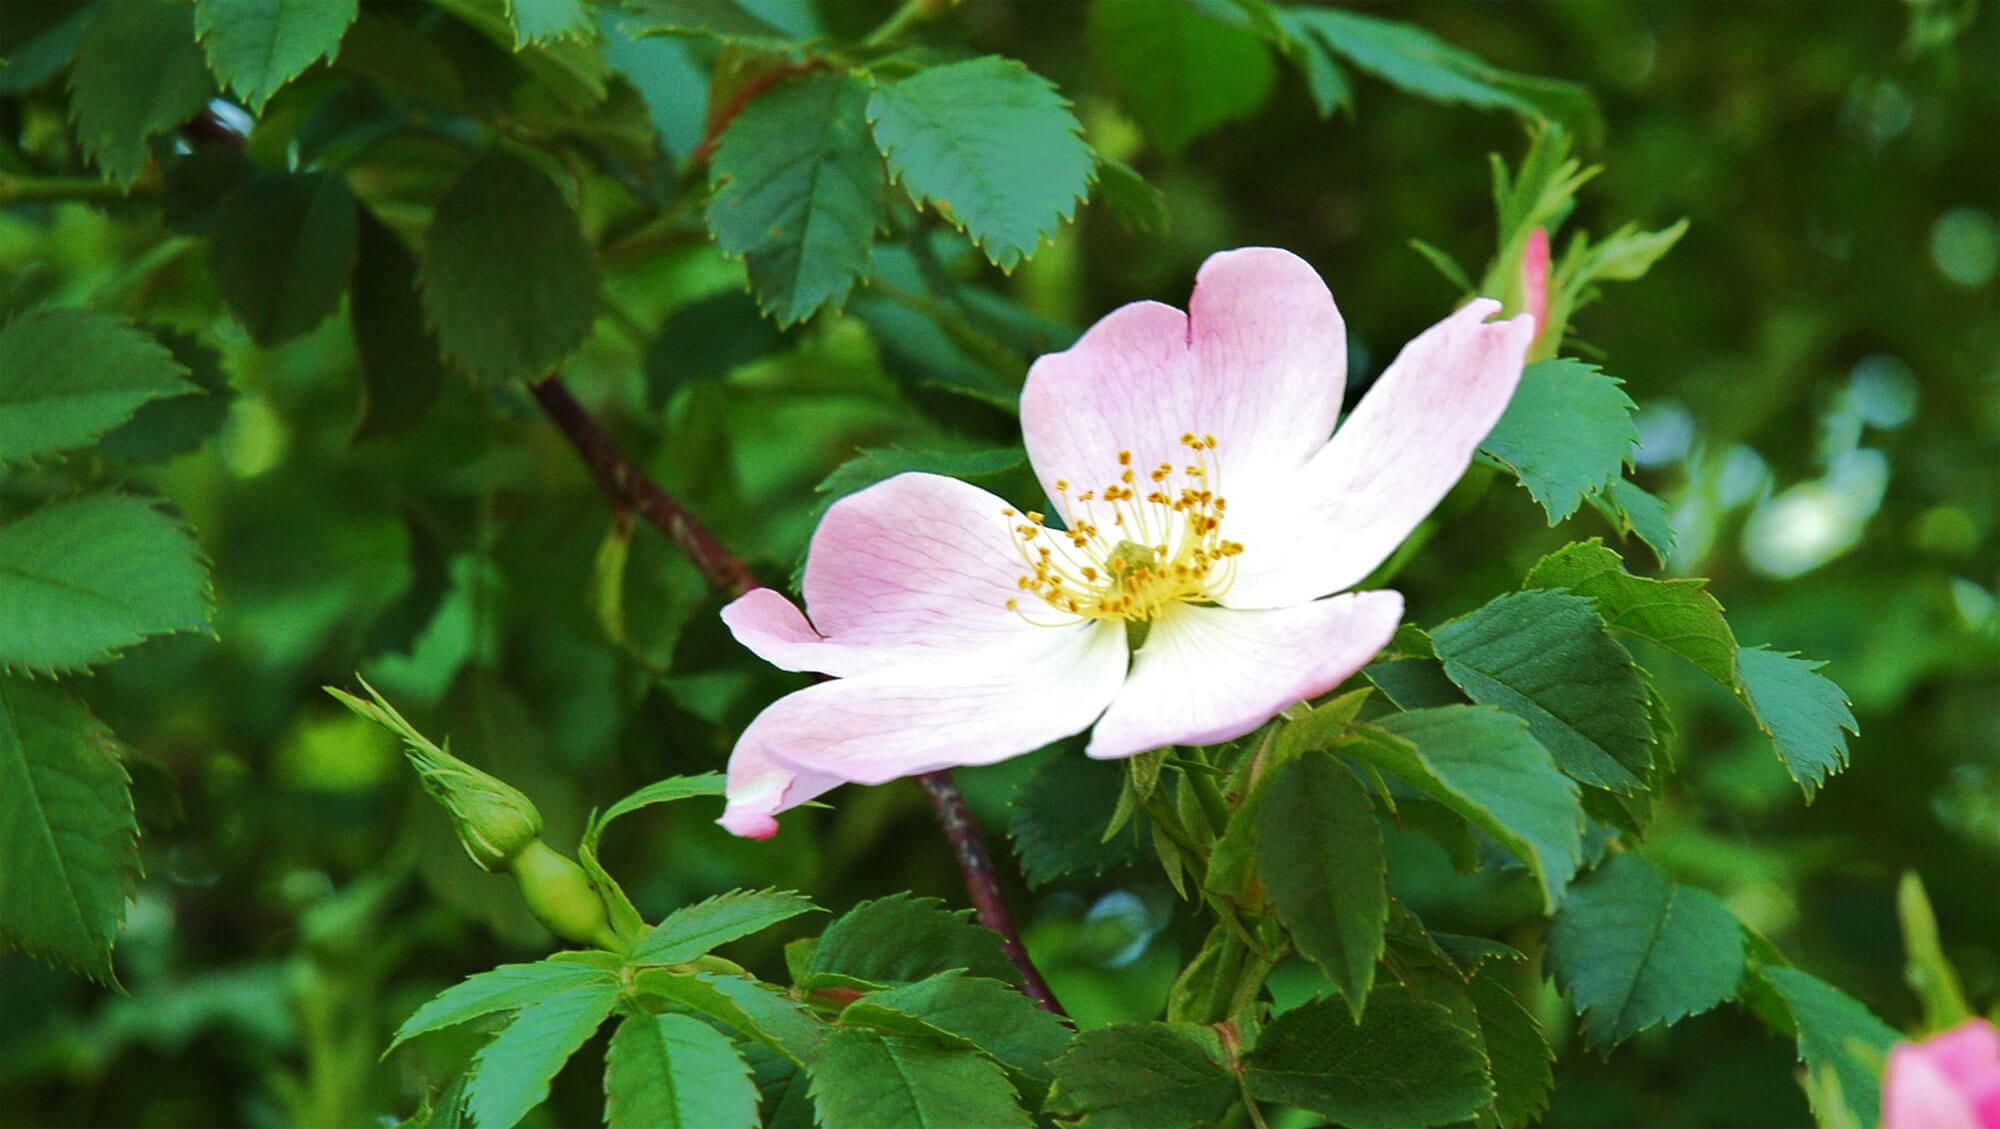 eglantier fleur balade de juin, ça sent les foins - La Salamandre